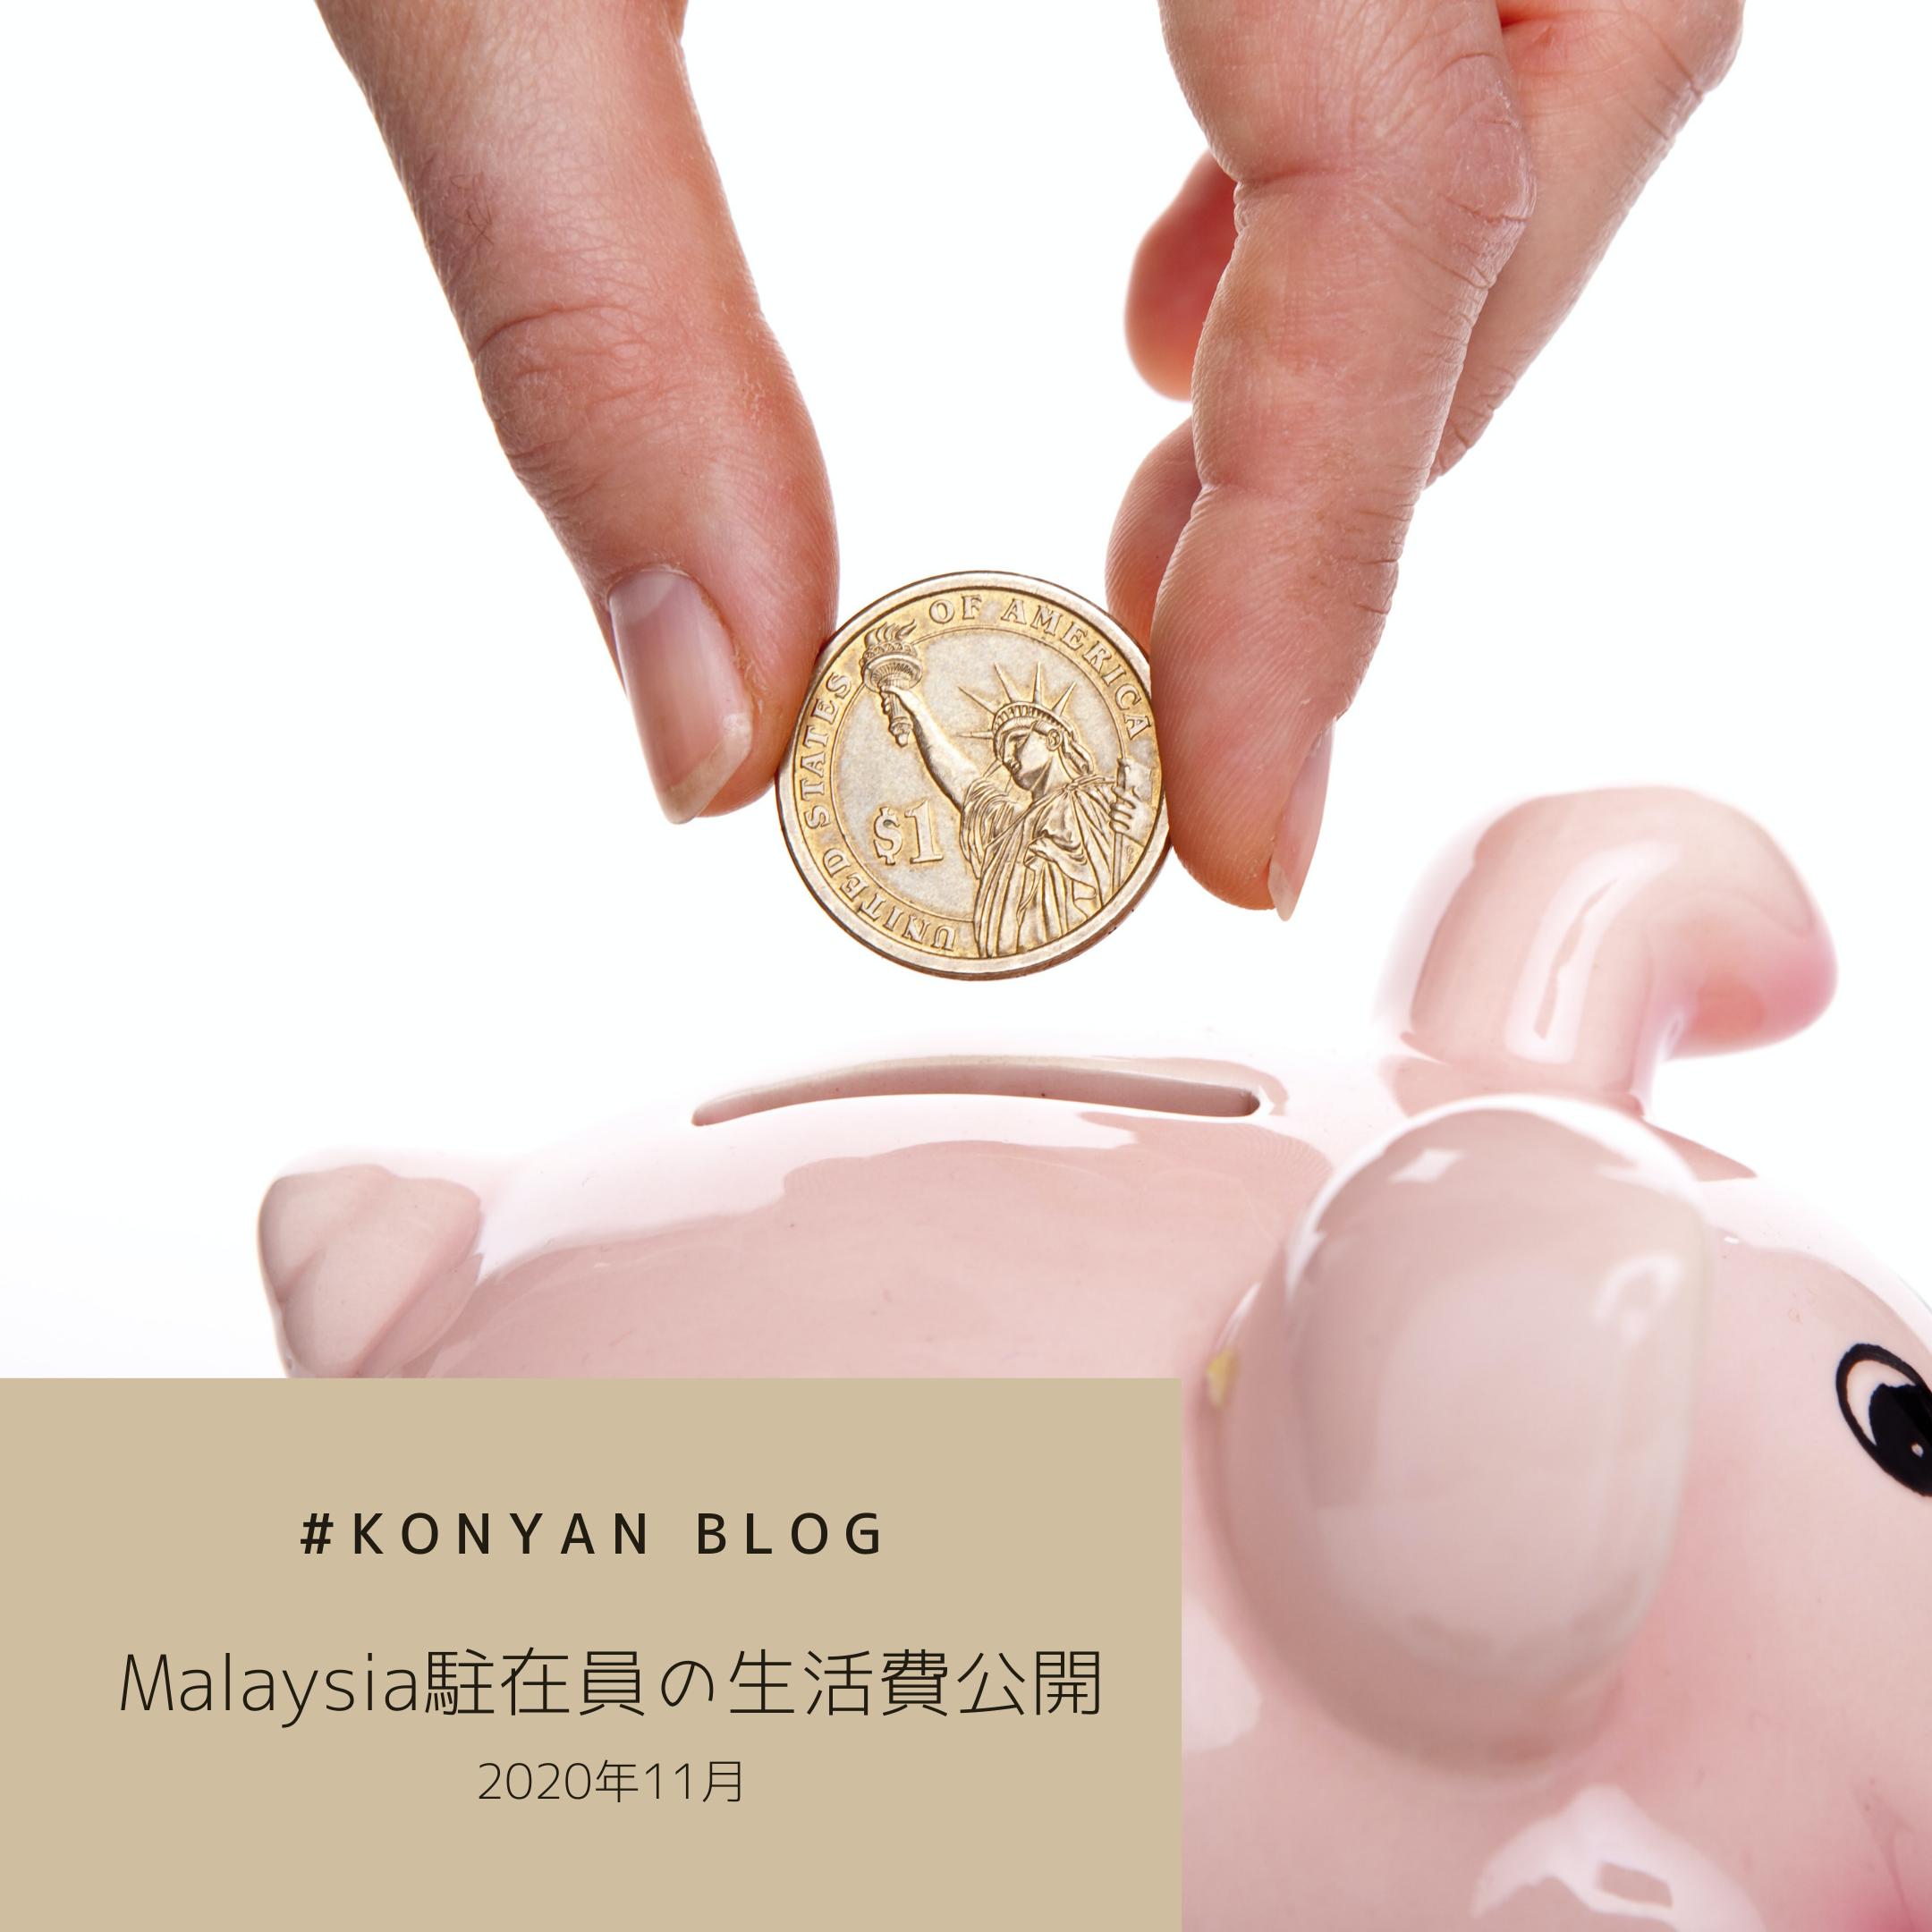 Malaysia駐在者の生活費,2020年11月